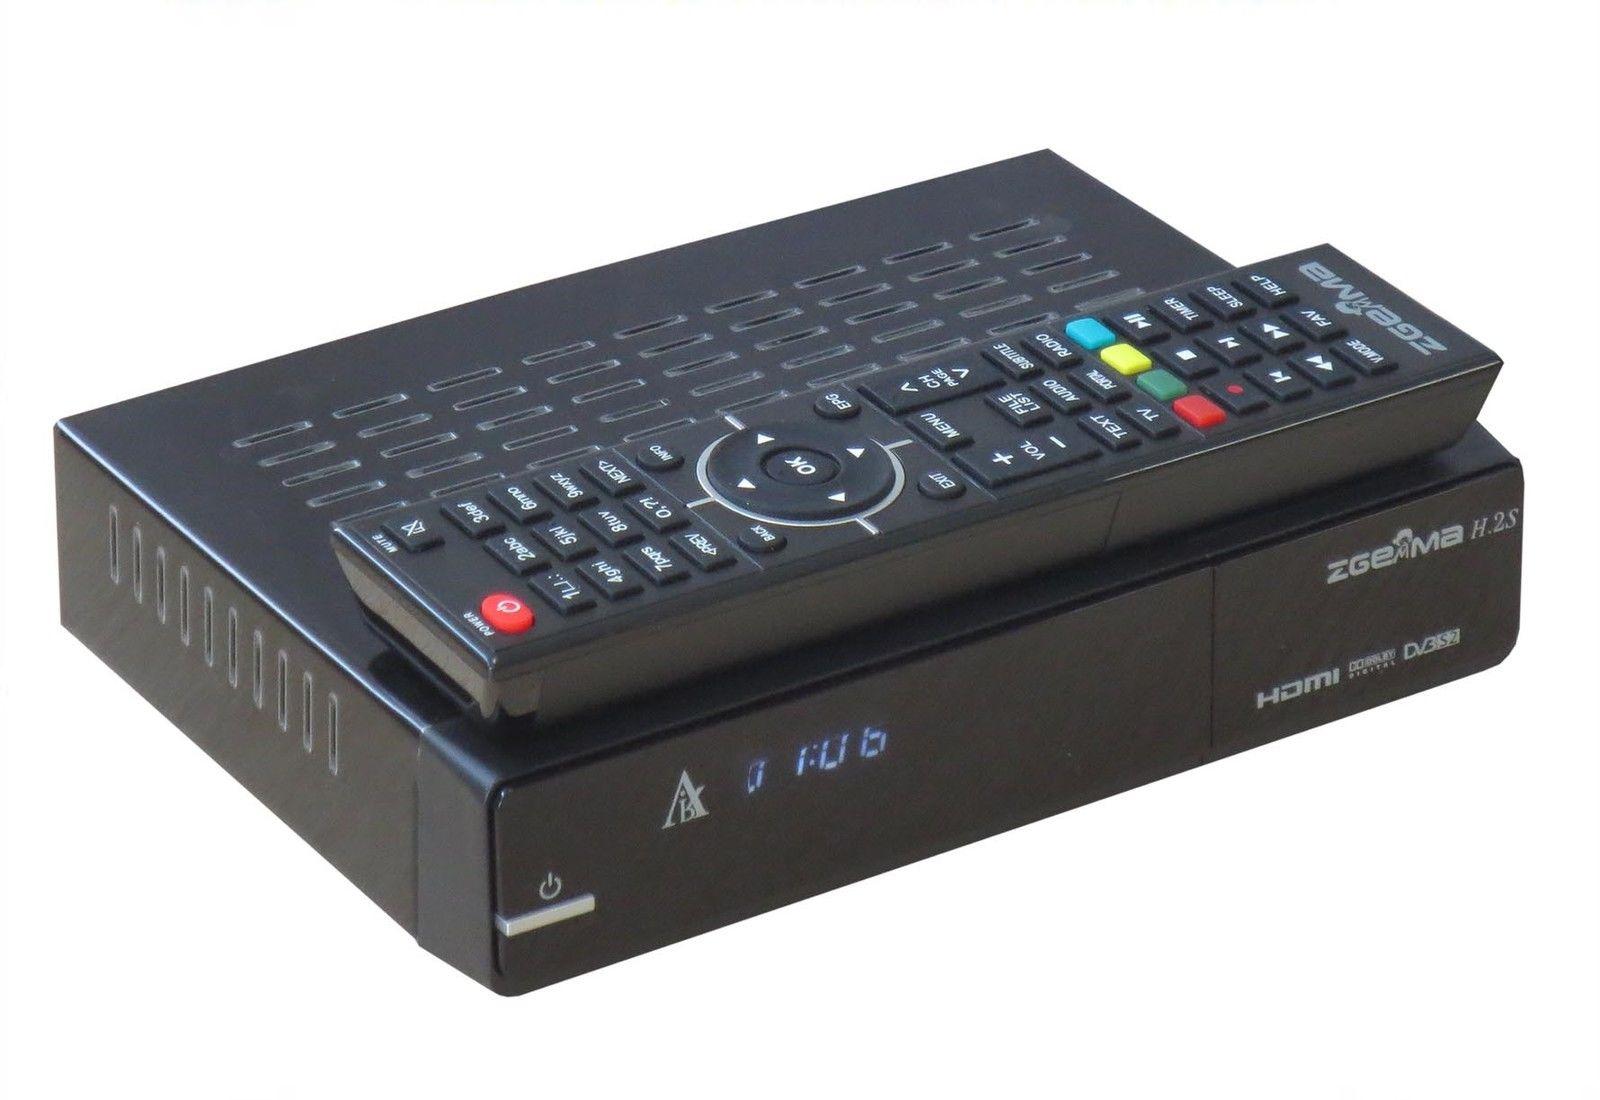 Zgemma Star H 2S Dual Core Twin Tuner Satellite Receiver Linux Enigma IPTV